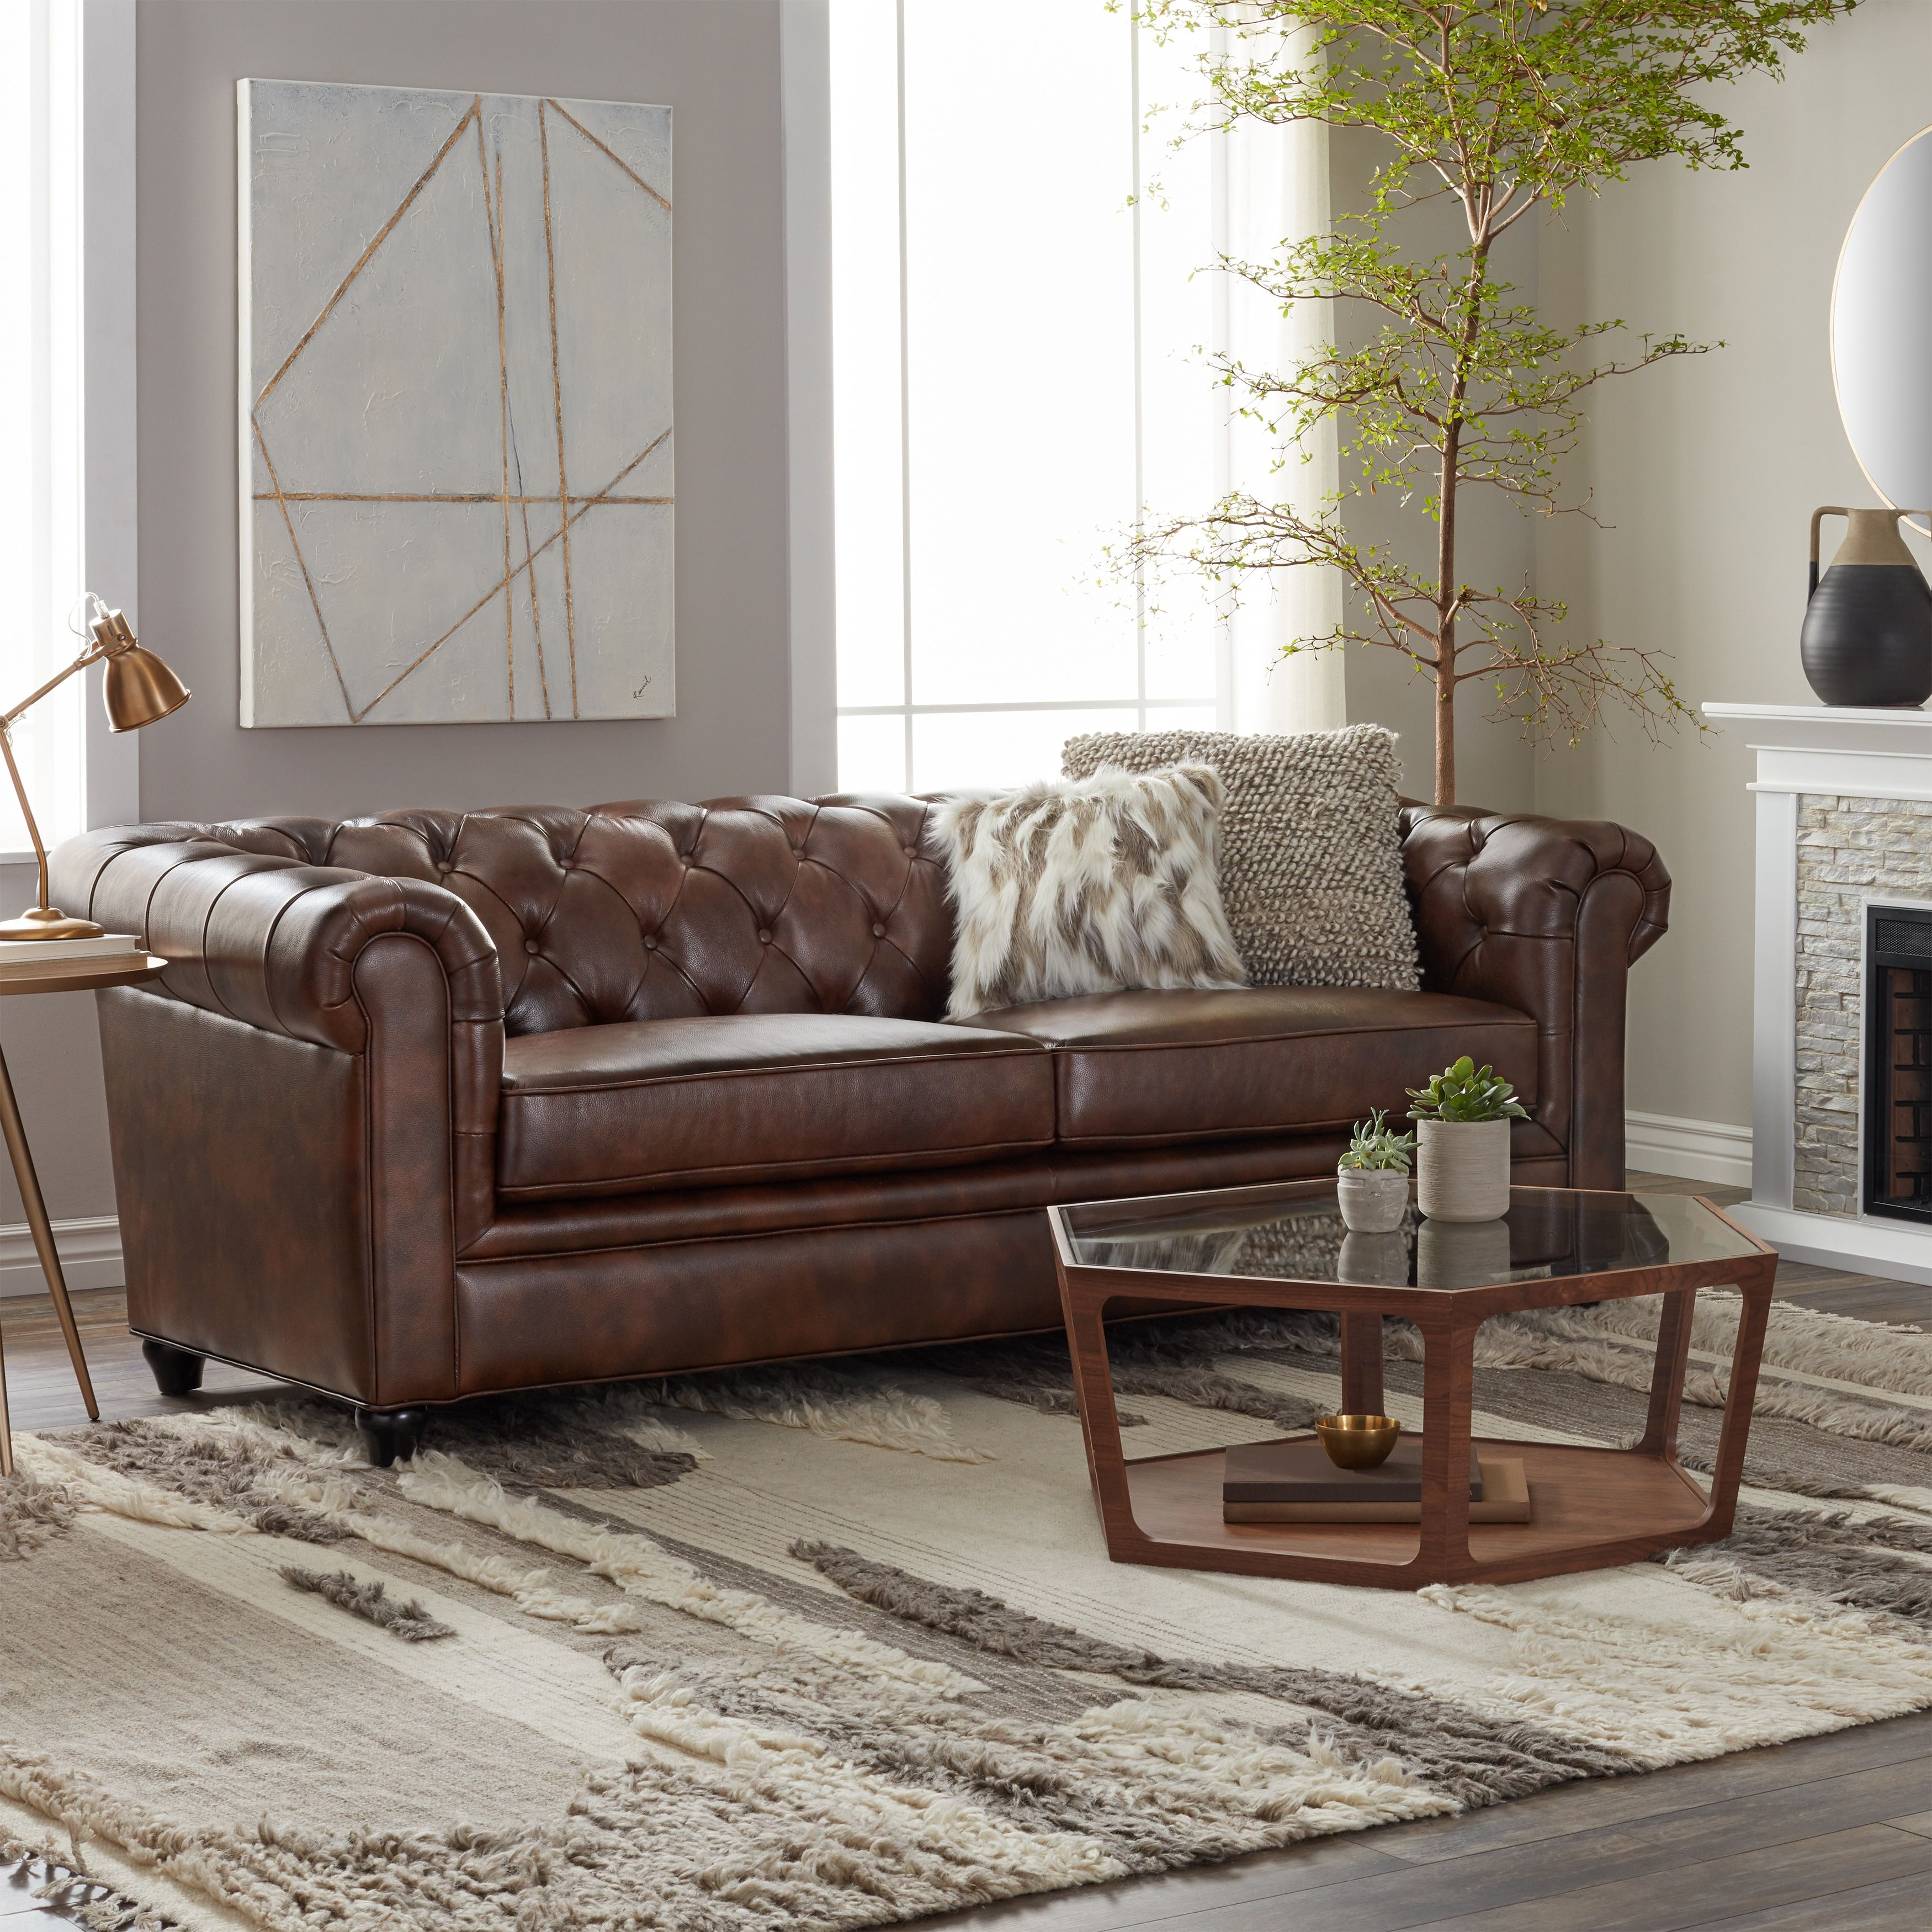 Abbyson Tuscan Top Grain Leather Chesterfield Sofa ...